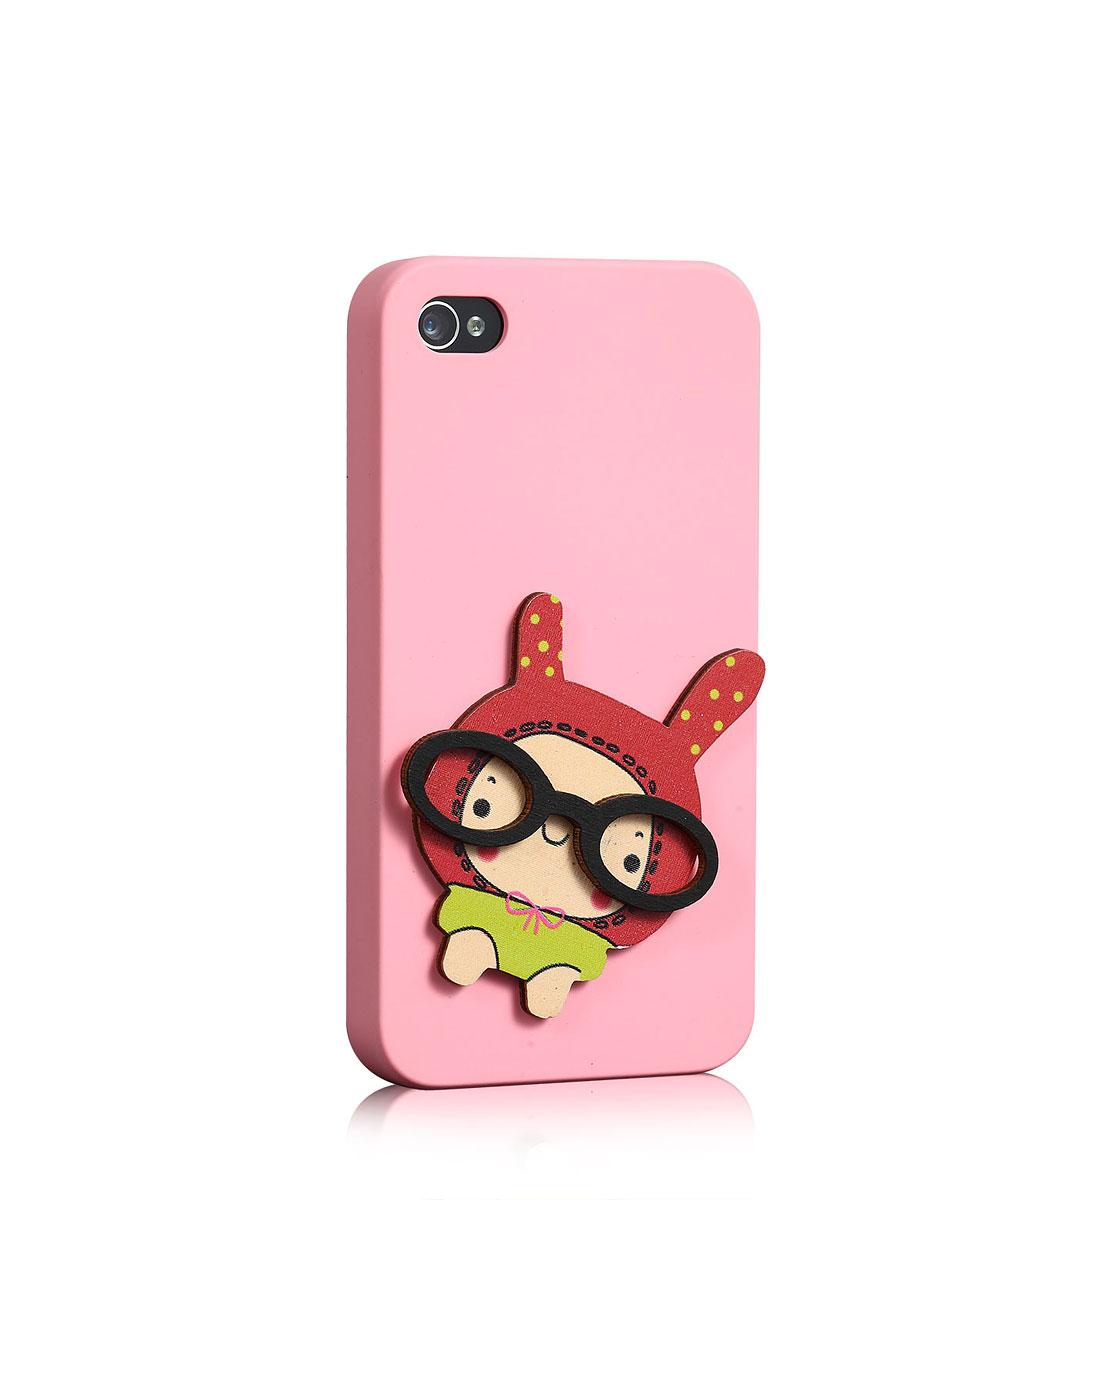 iphone4/4s眼镜娃娃可爱手机套